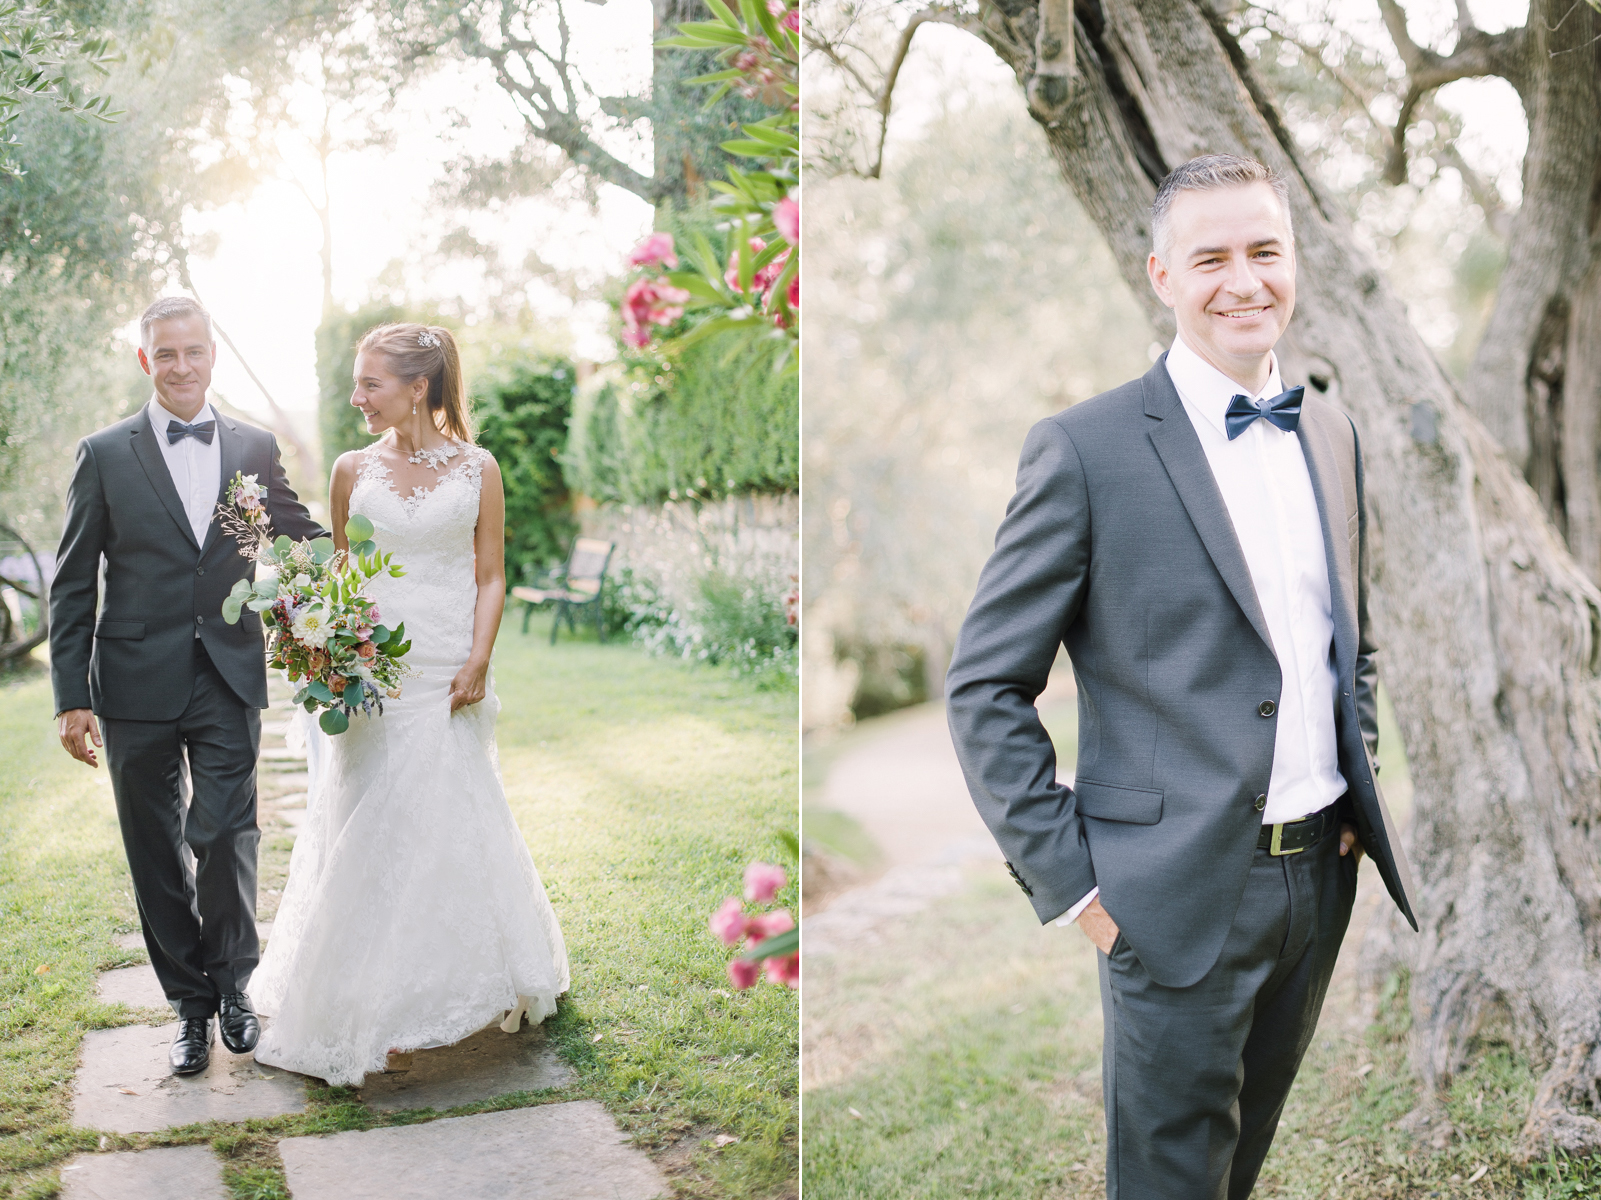 BohemeMoonPhotography-Grasse-provence-wedding-photographer_10.jpg